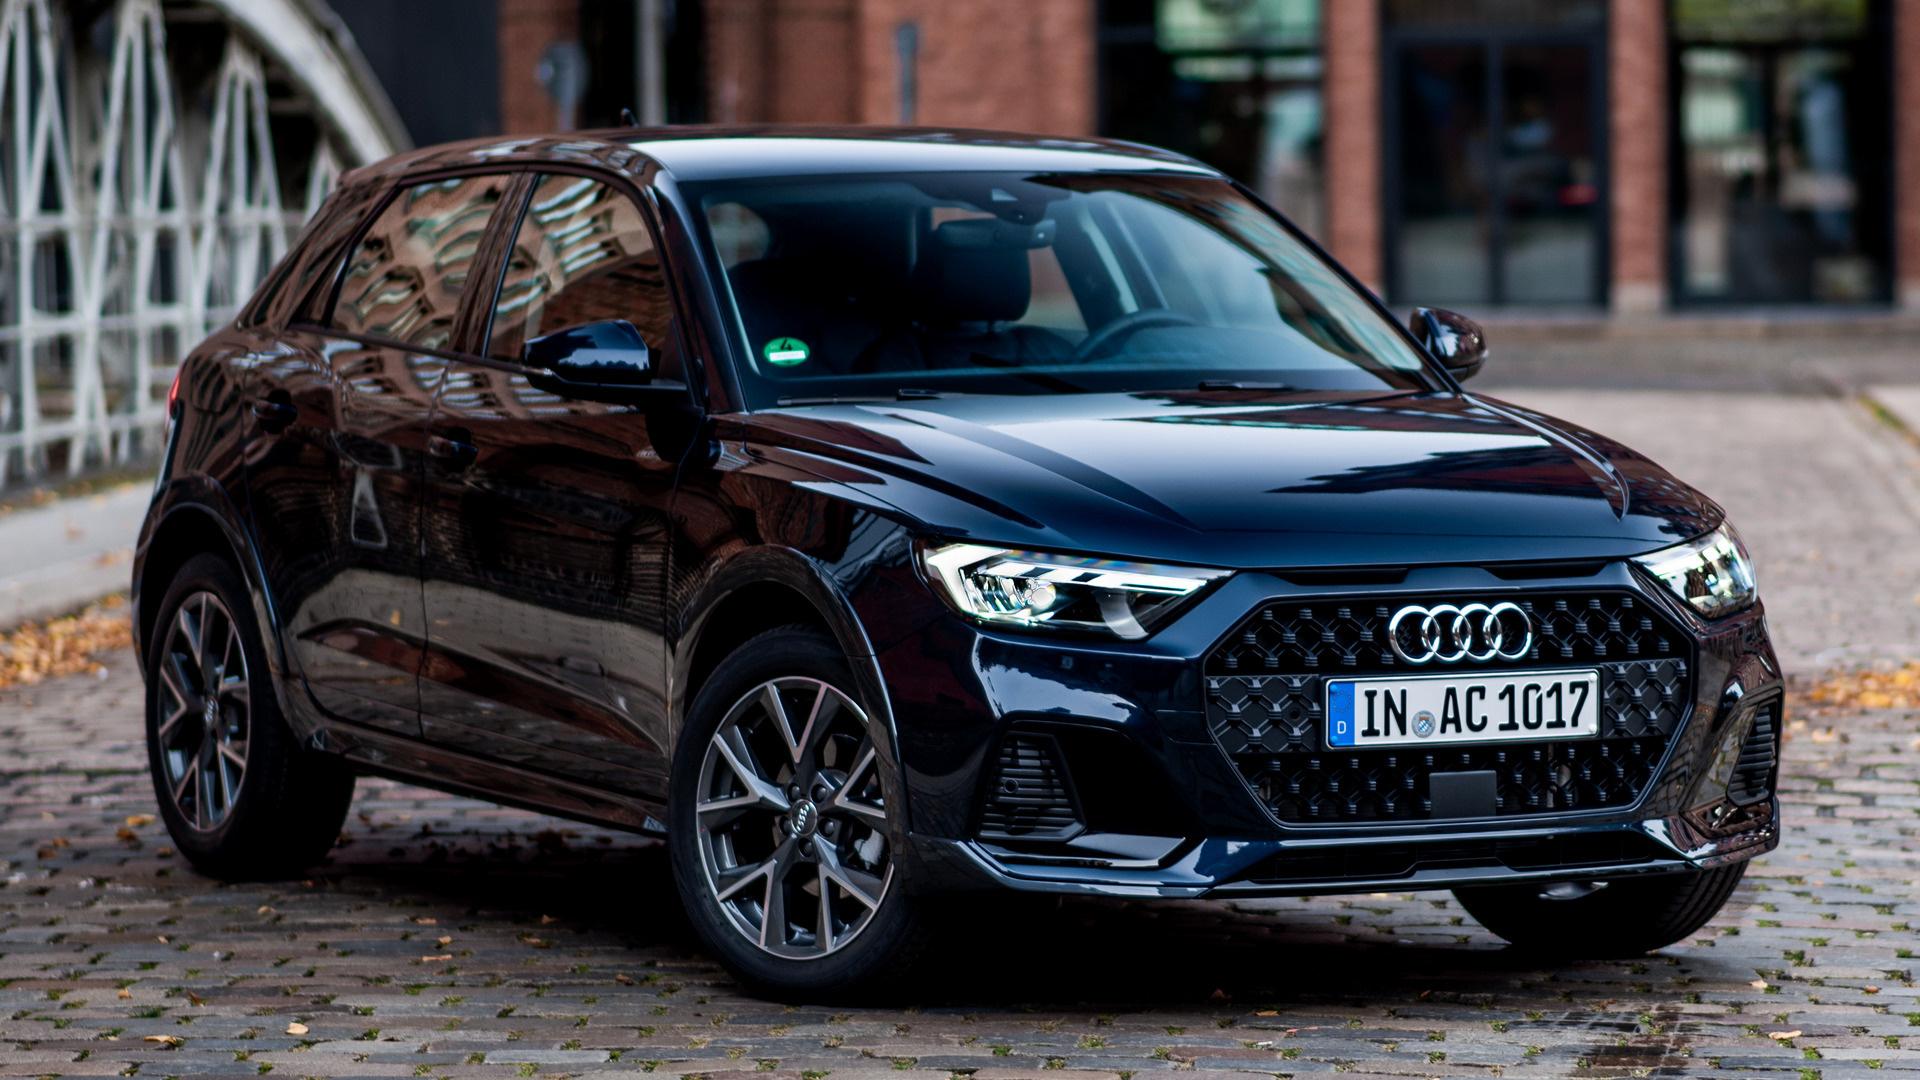 2019 Audi A1 Citycarver